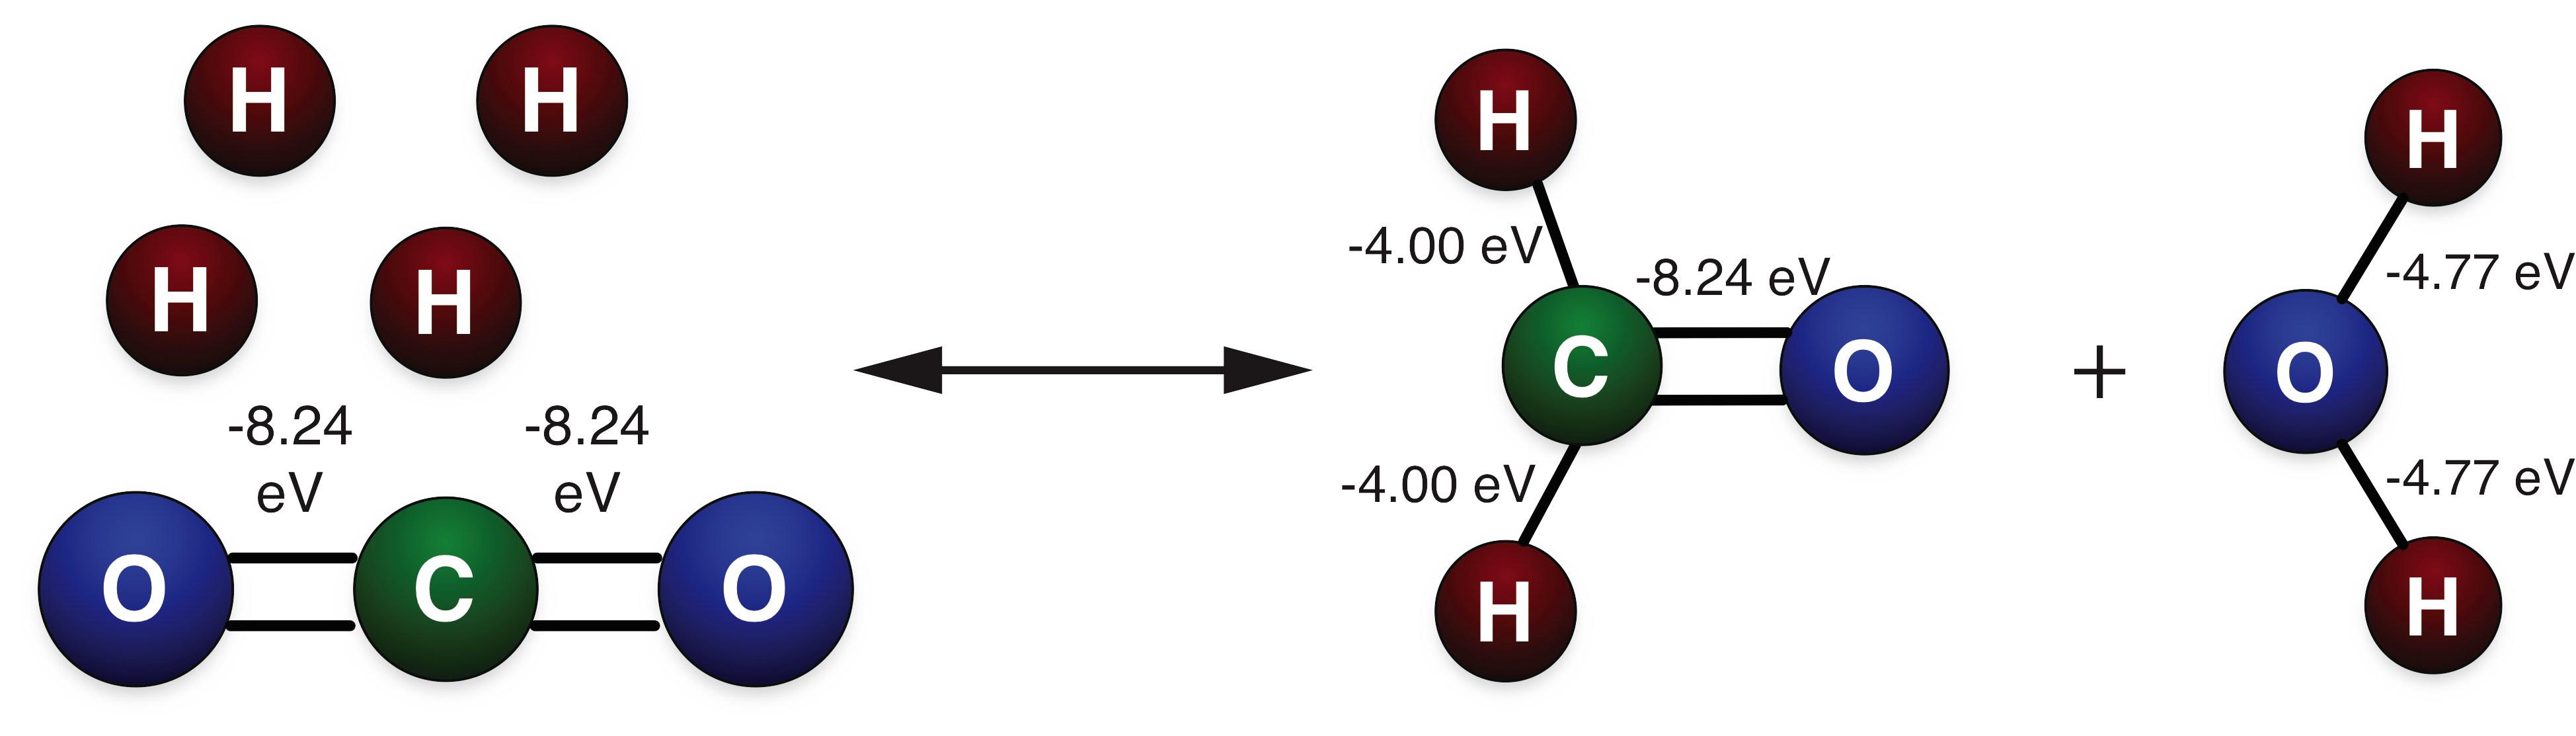 photosynthesis reaction